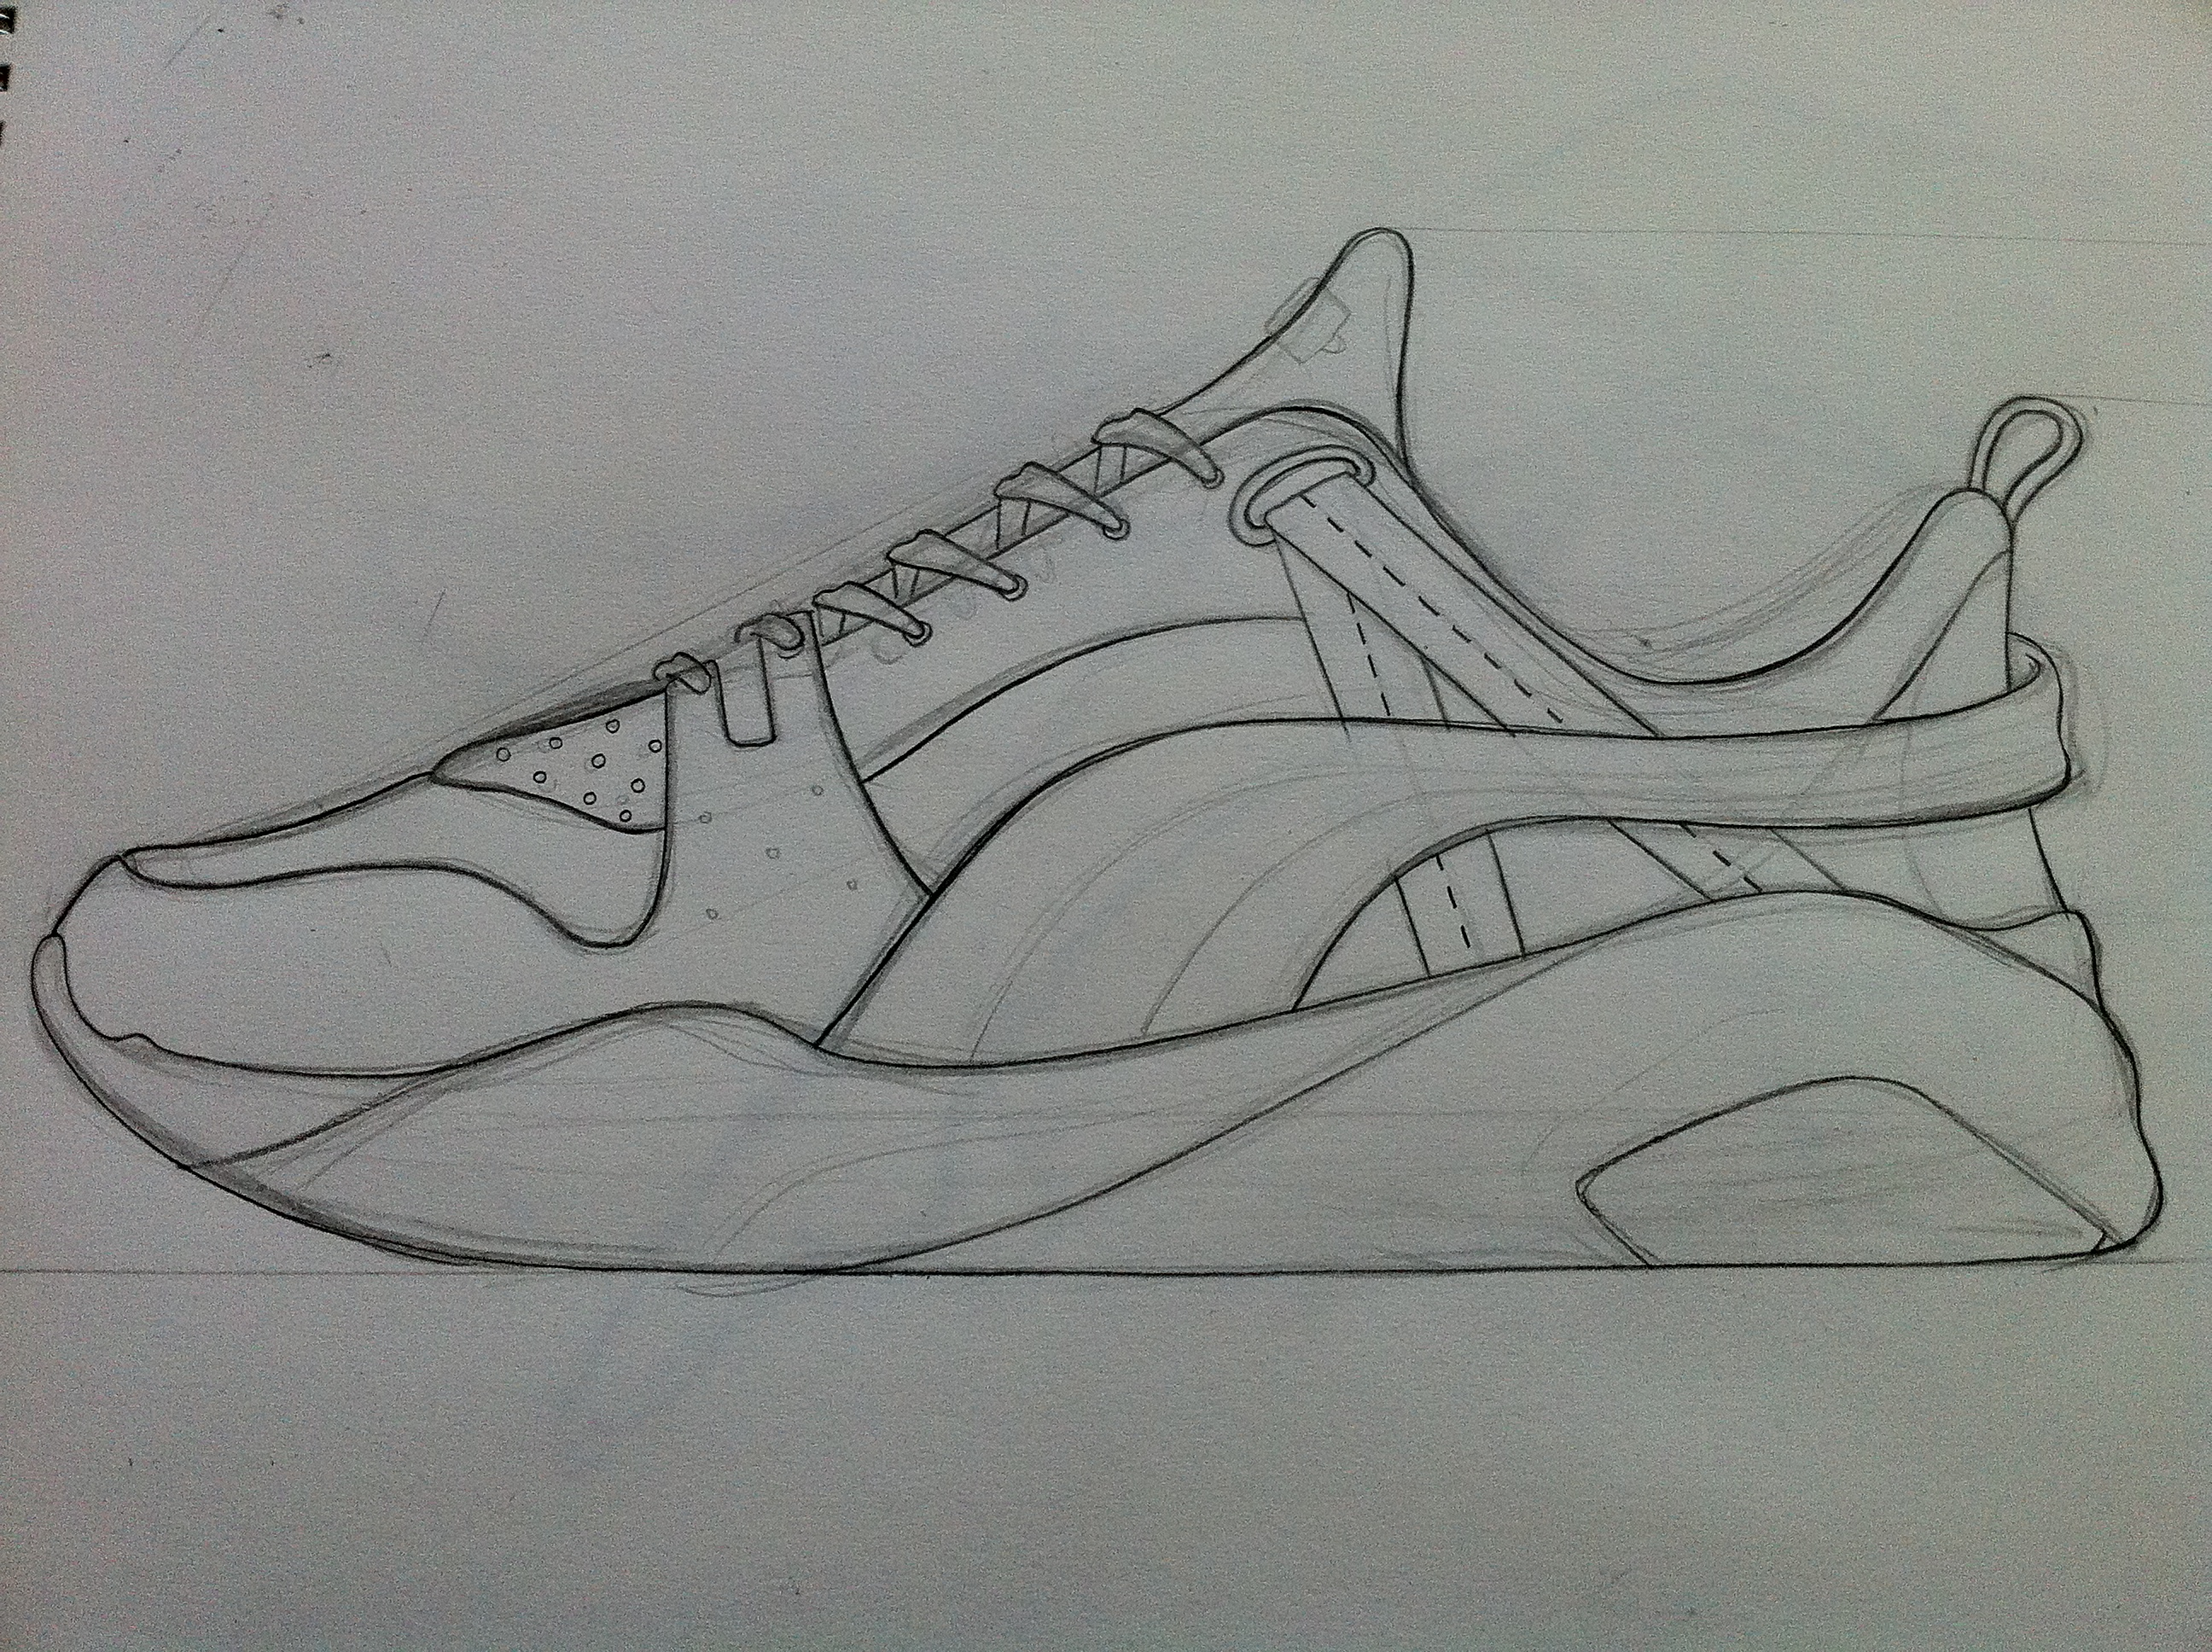 Drawn shoe puma By inspired own Ronnie Sketch